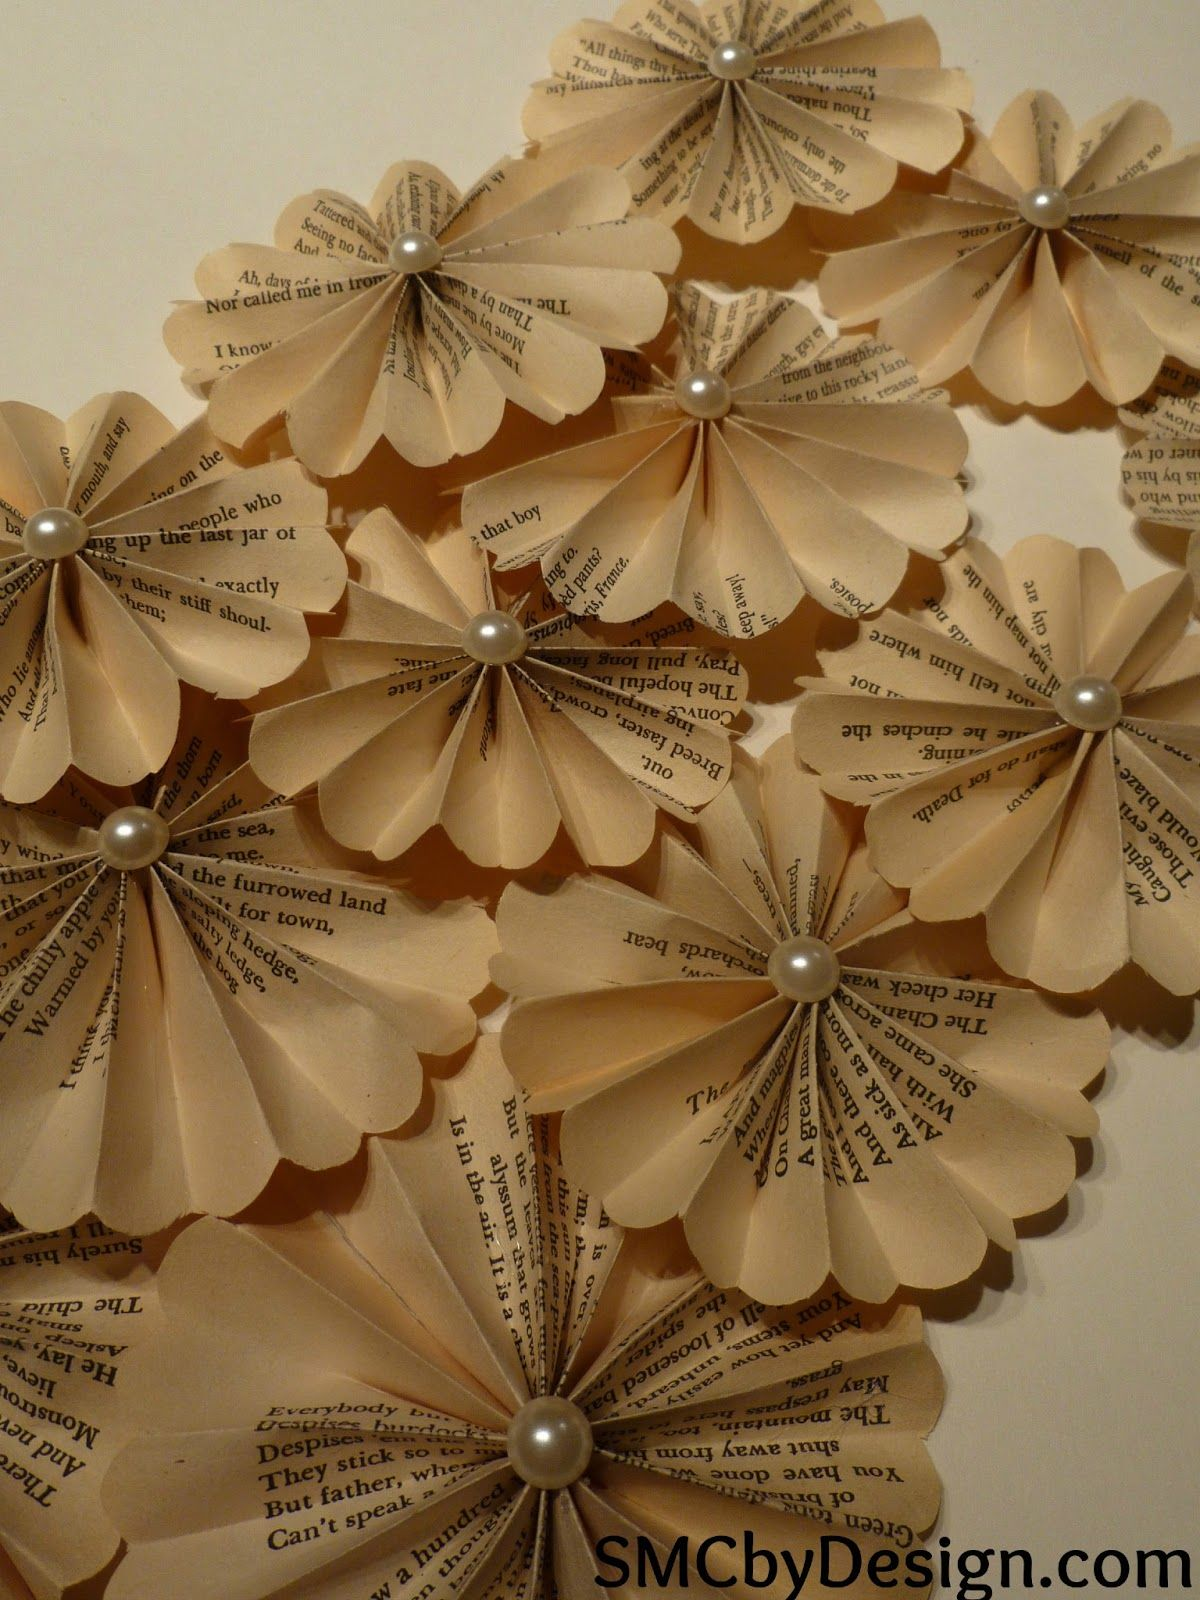 Smc By Design Vintage Paper Flowers Paper Flowers Flower Crafts Vintage Paper